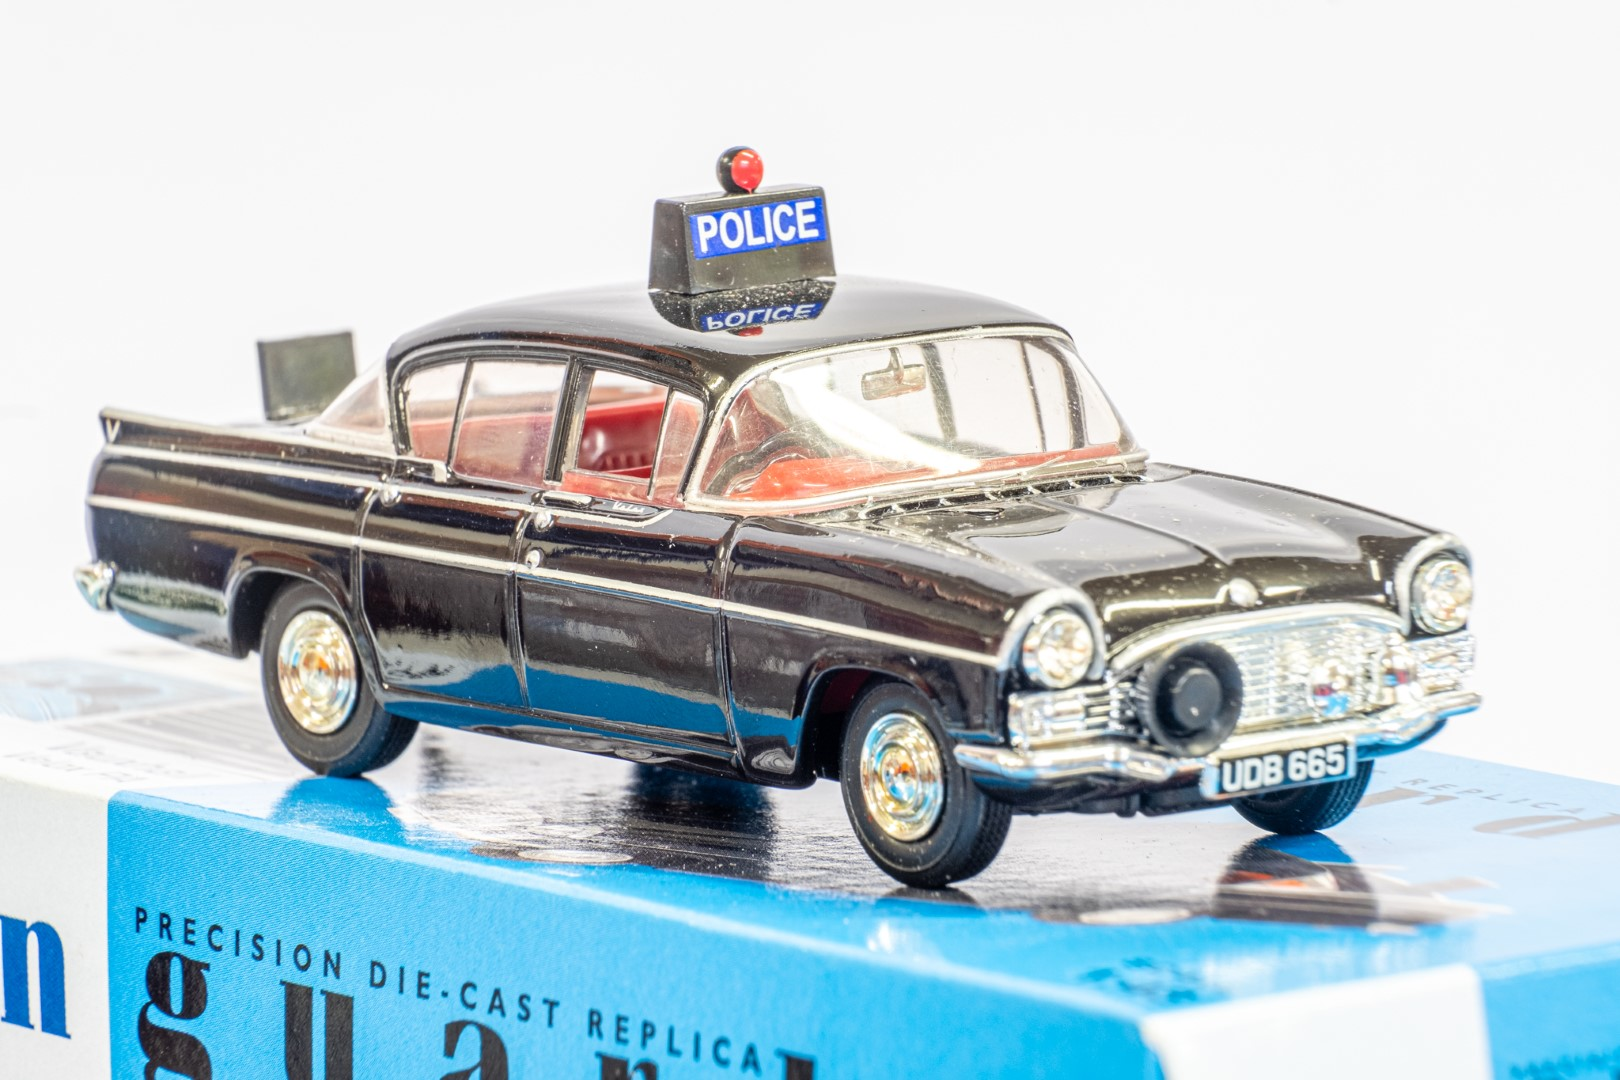 Vanguards Vauxhall Velox PA - Stockport Borough Police - Image 8 of 8